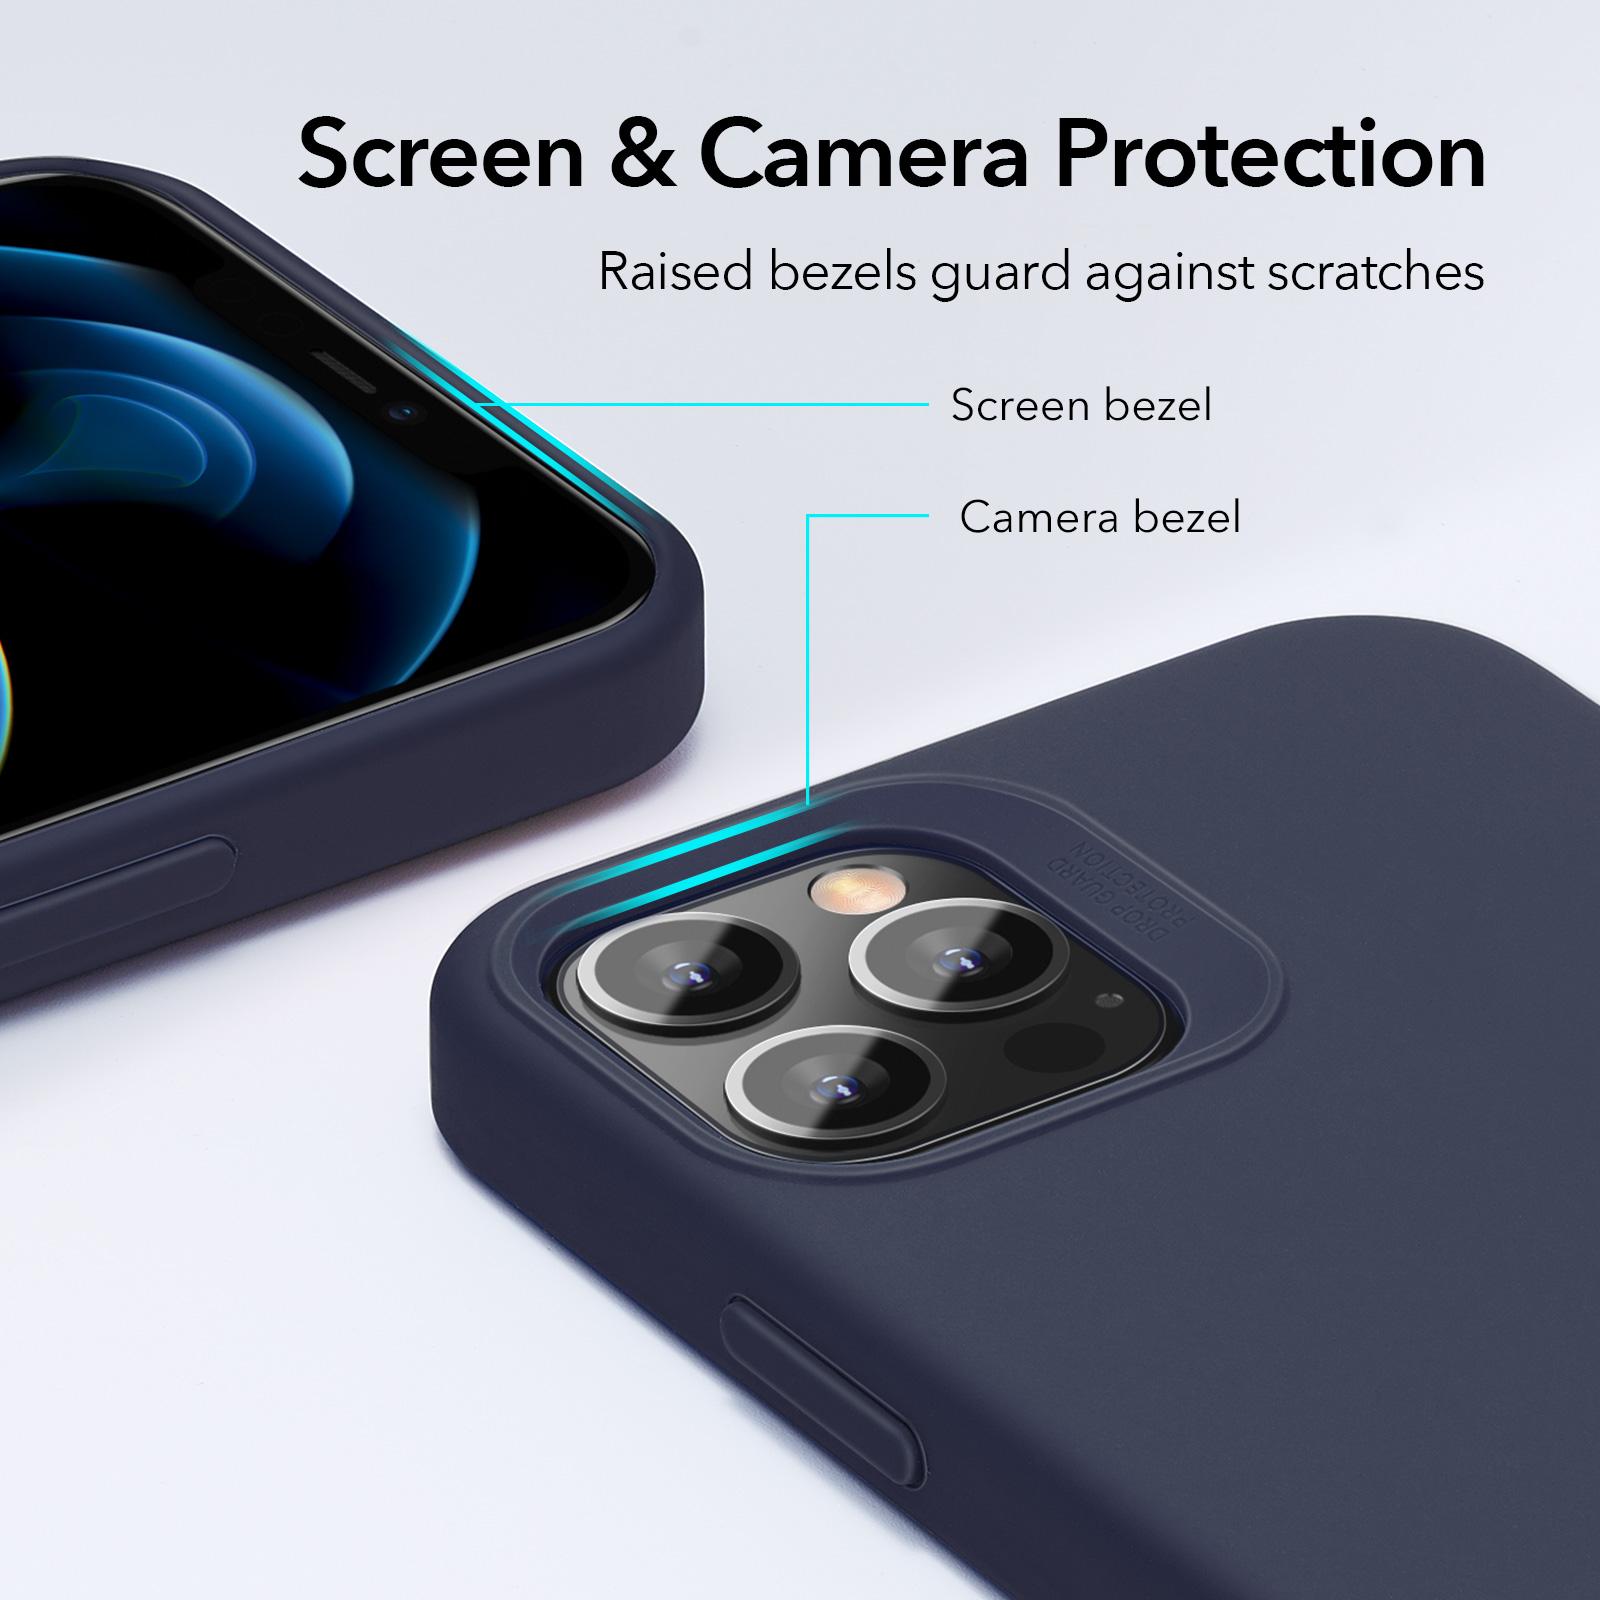 [Screen & Camera Protection]